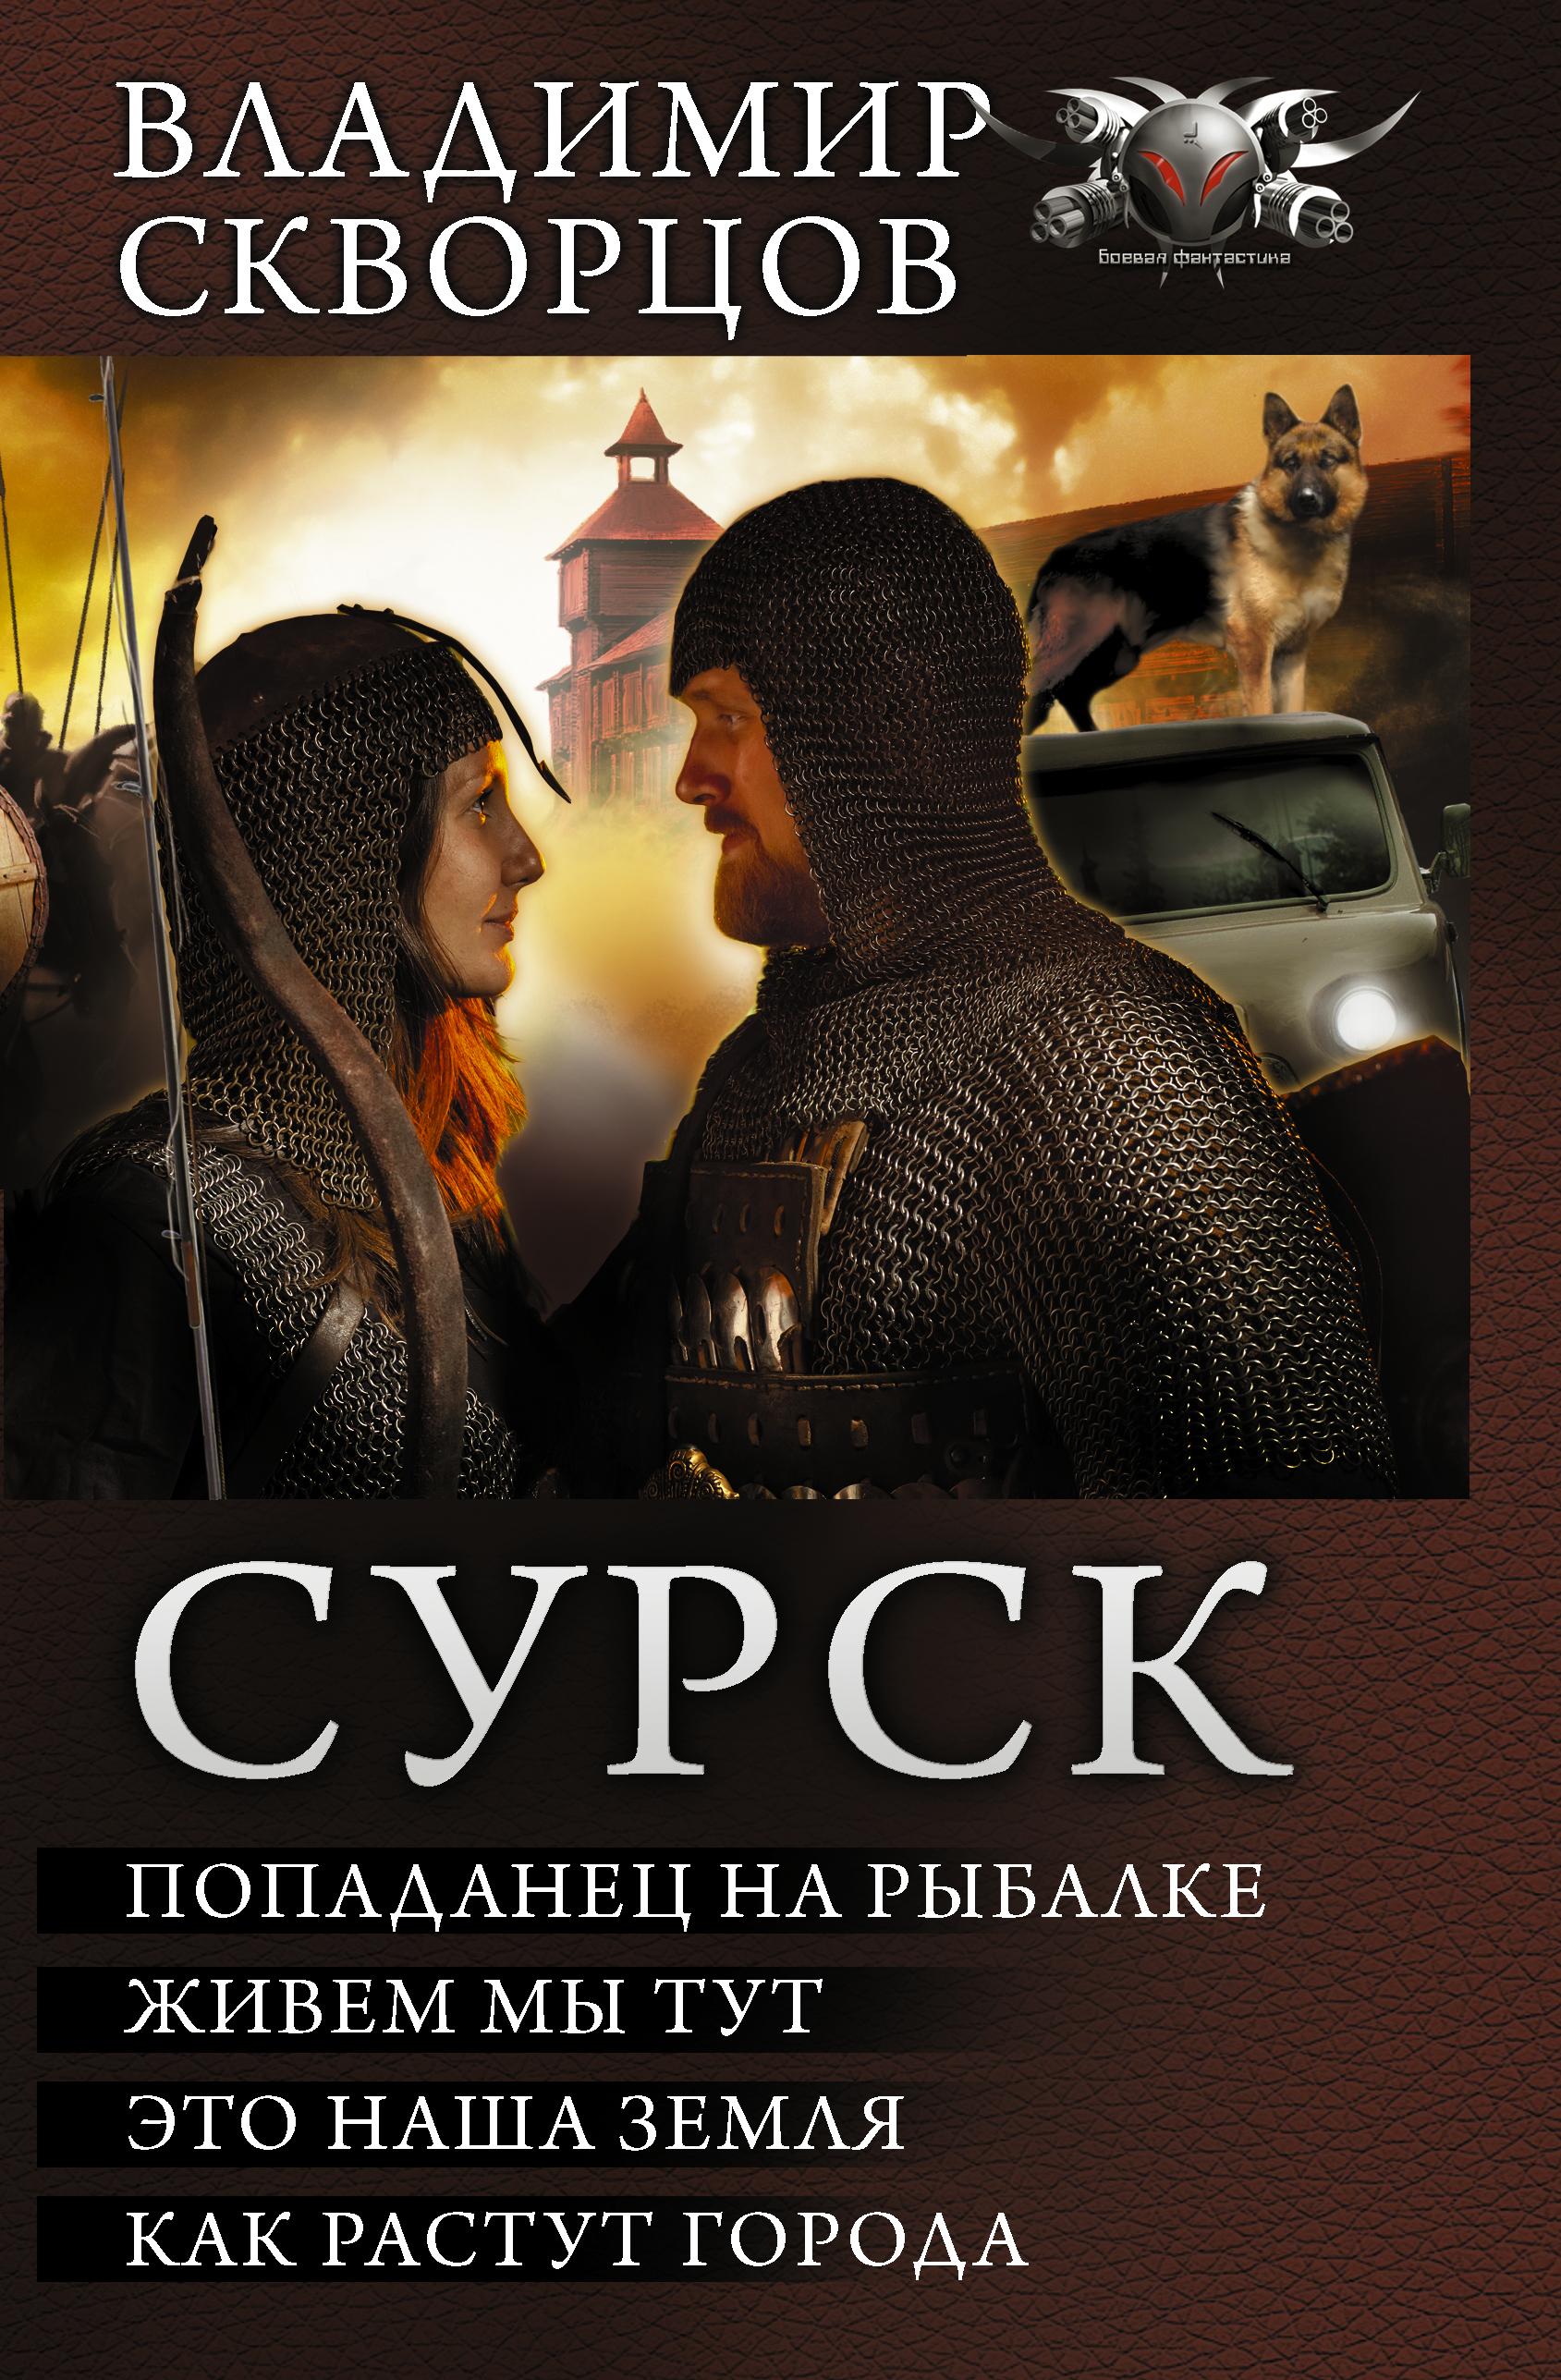 Владимир Скворцов Сурск запчасти